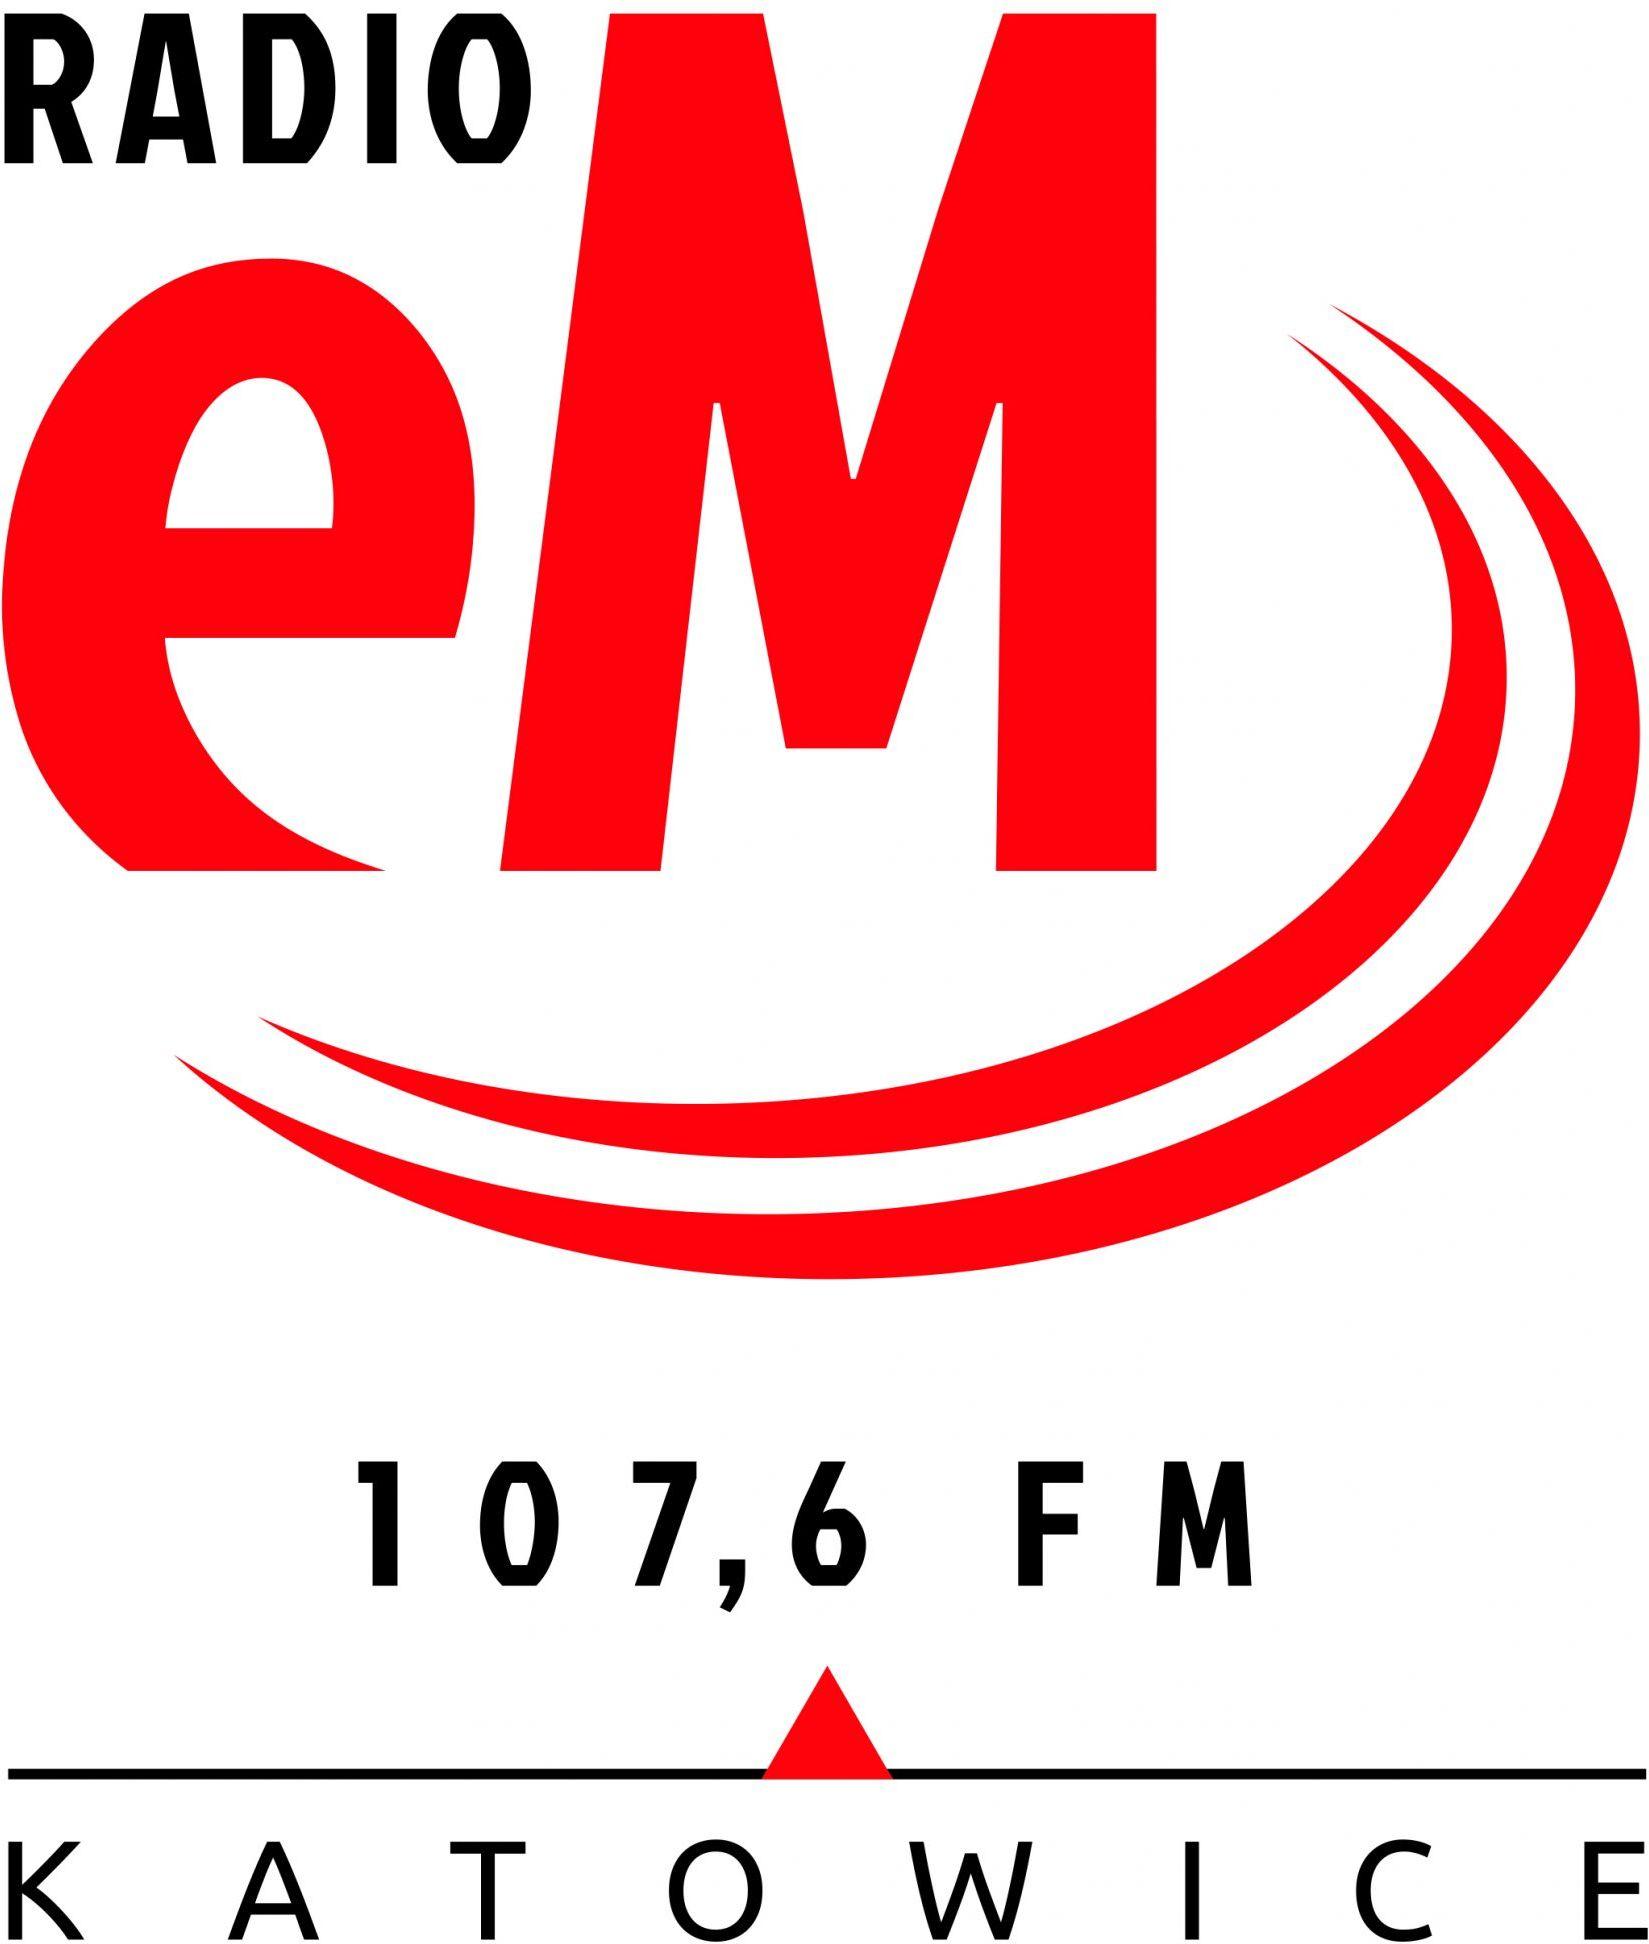 Radio eM 107,6 FM